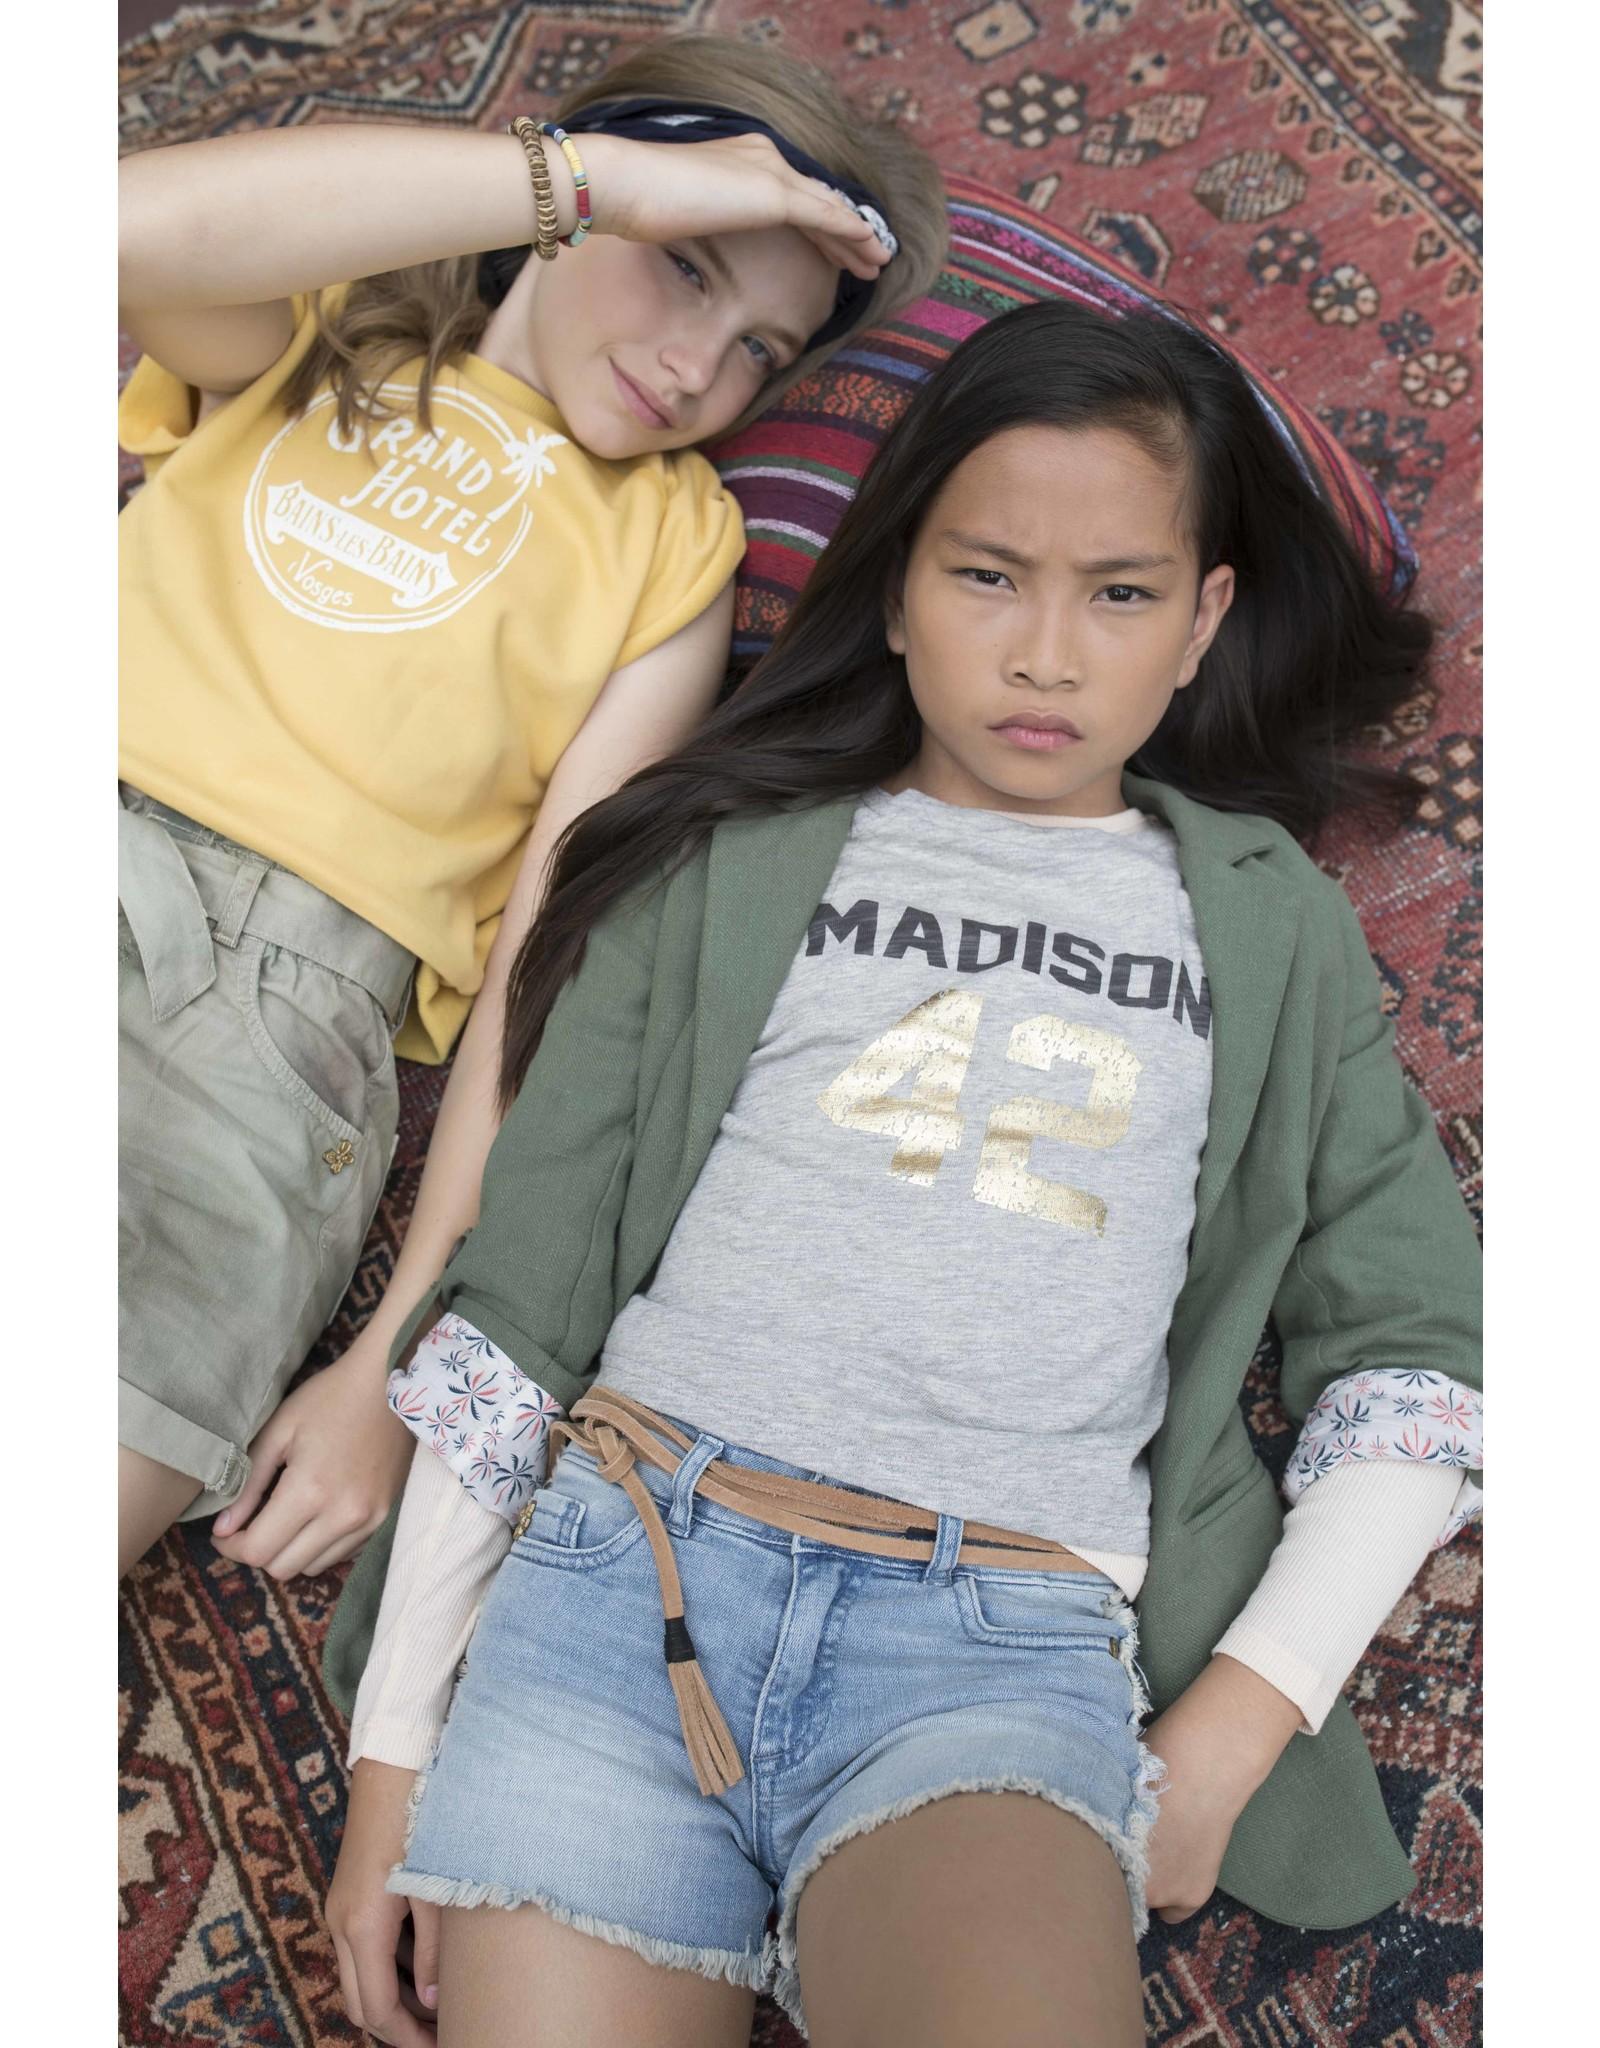 Street Called Madison SCM Luna Slub short sleeve Tee Happy LGR Mel